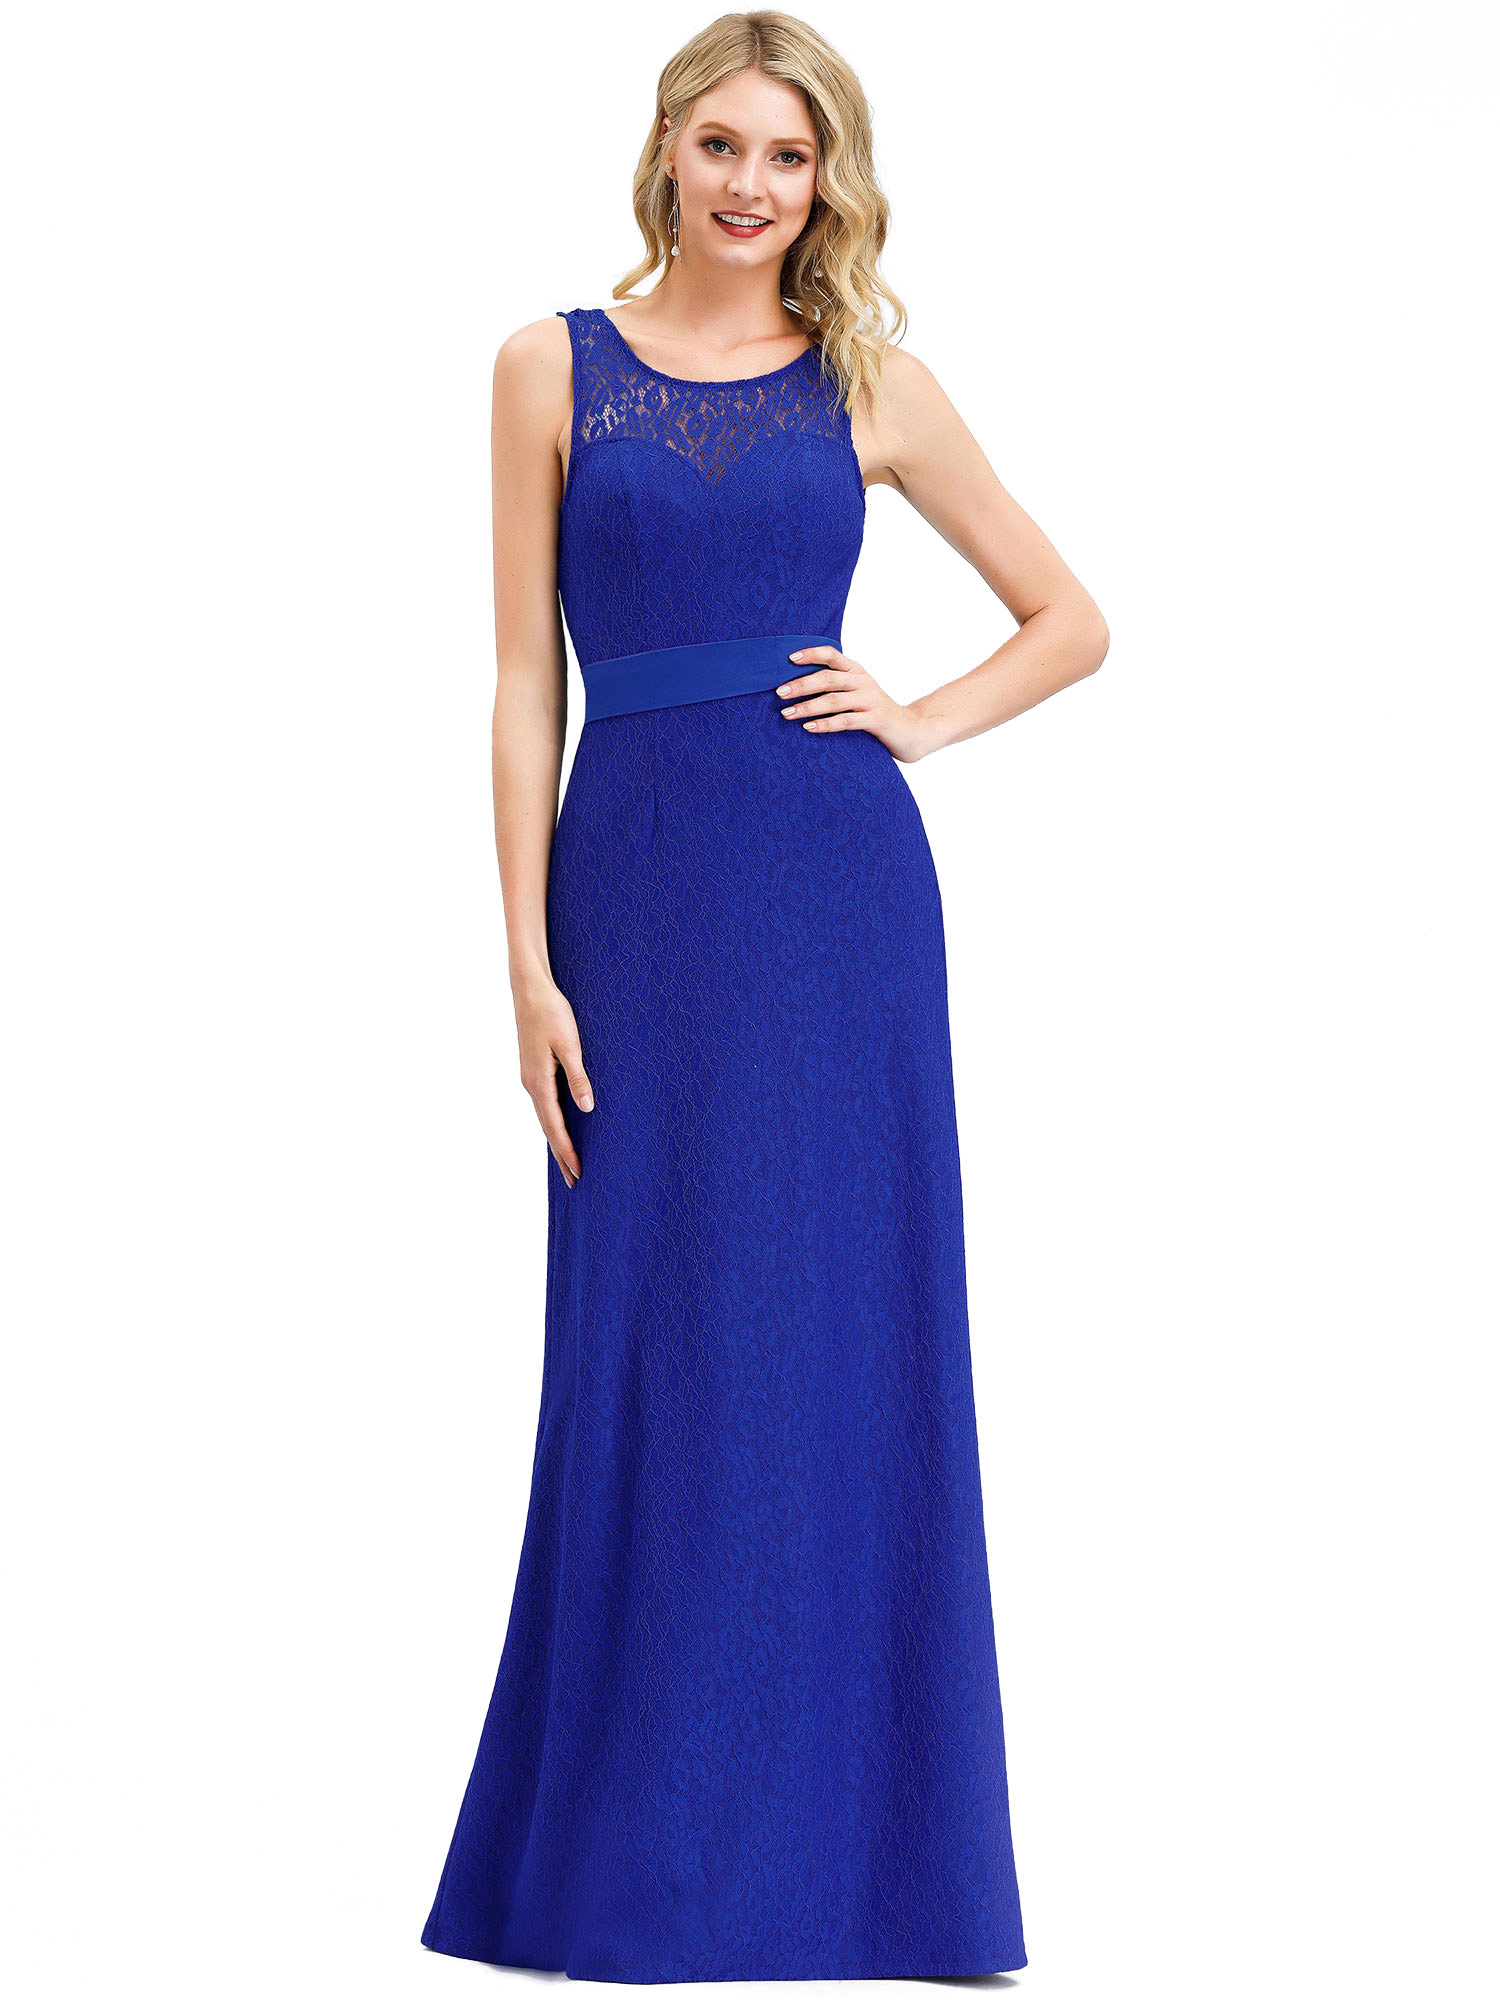 8e2d3df213c Dark Blue Satin Bridesmaid Dresses - Data Dynamic AG